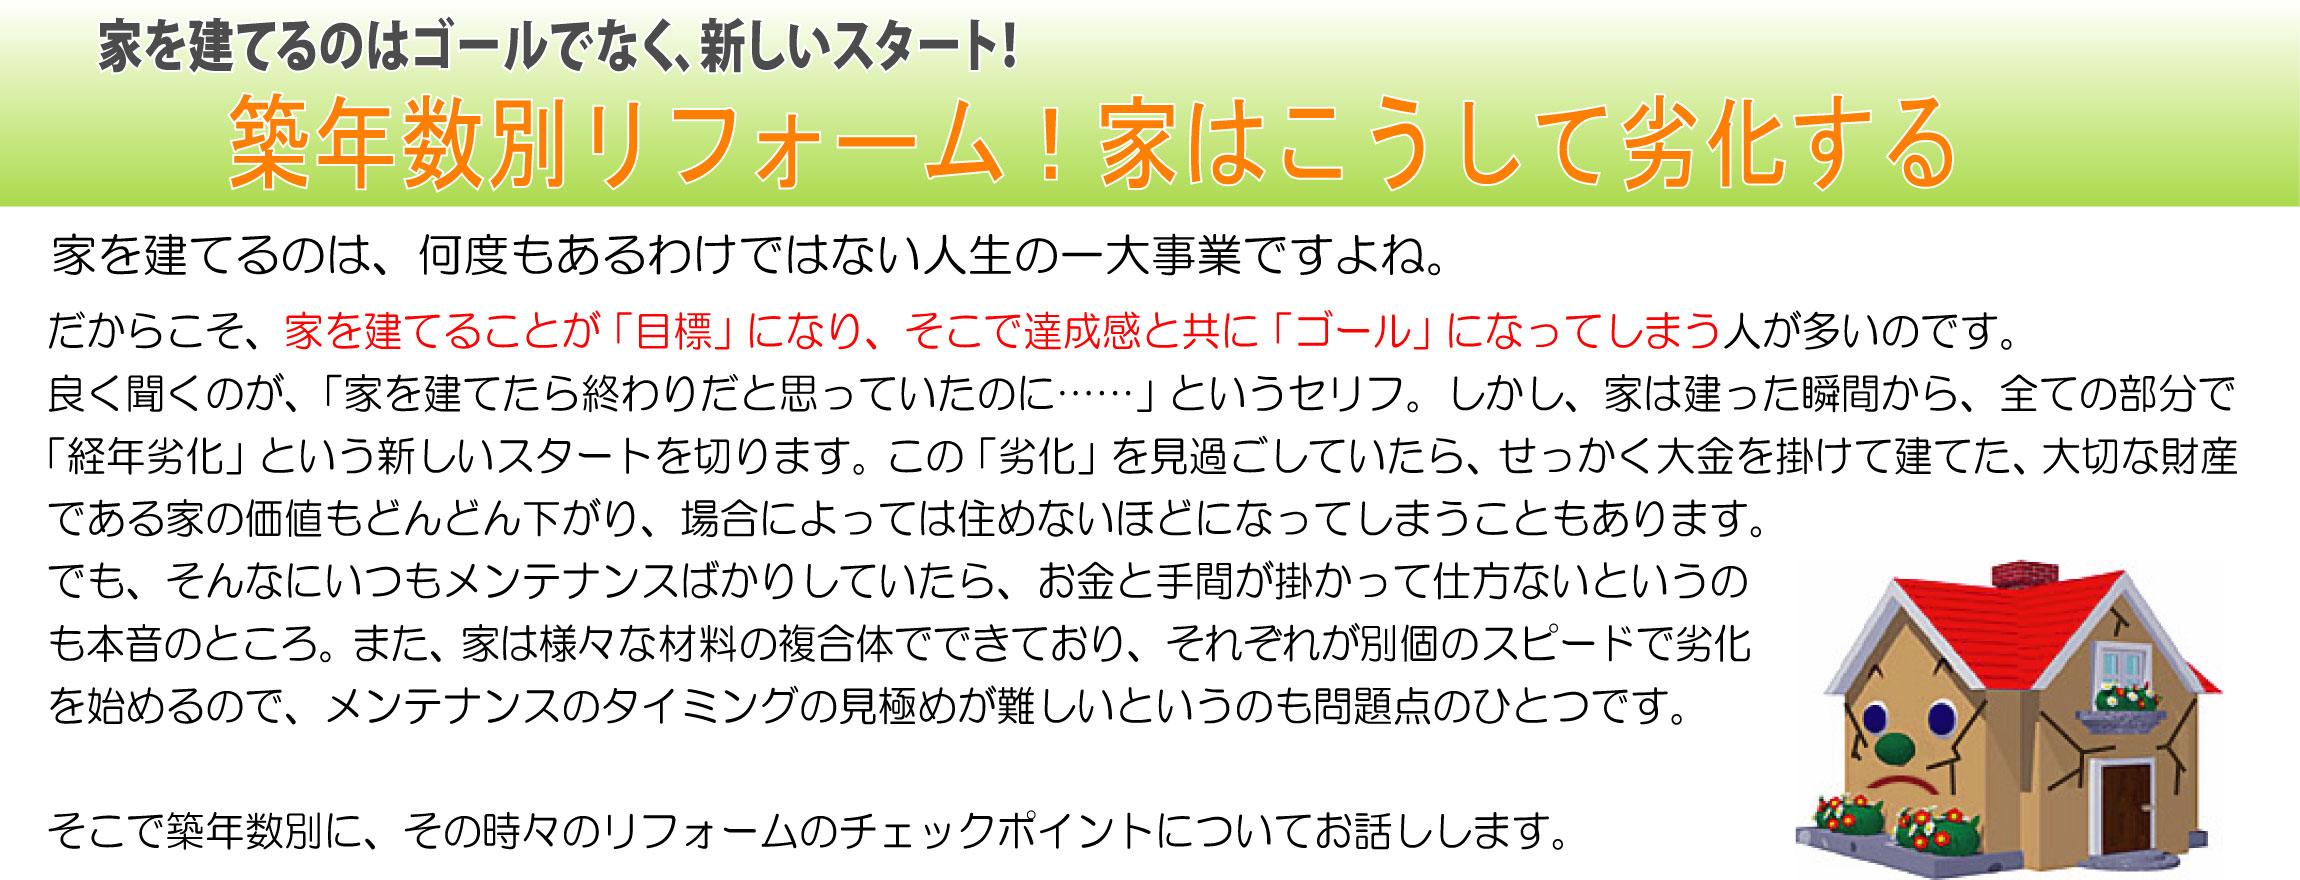 KuraSi-natu-sin65-06.jpg